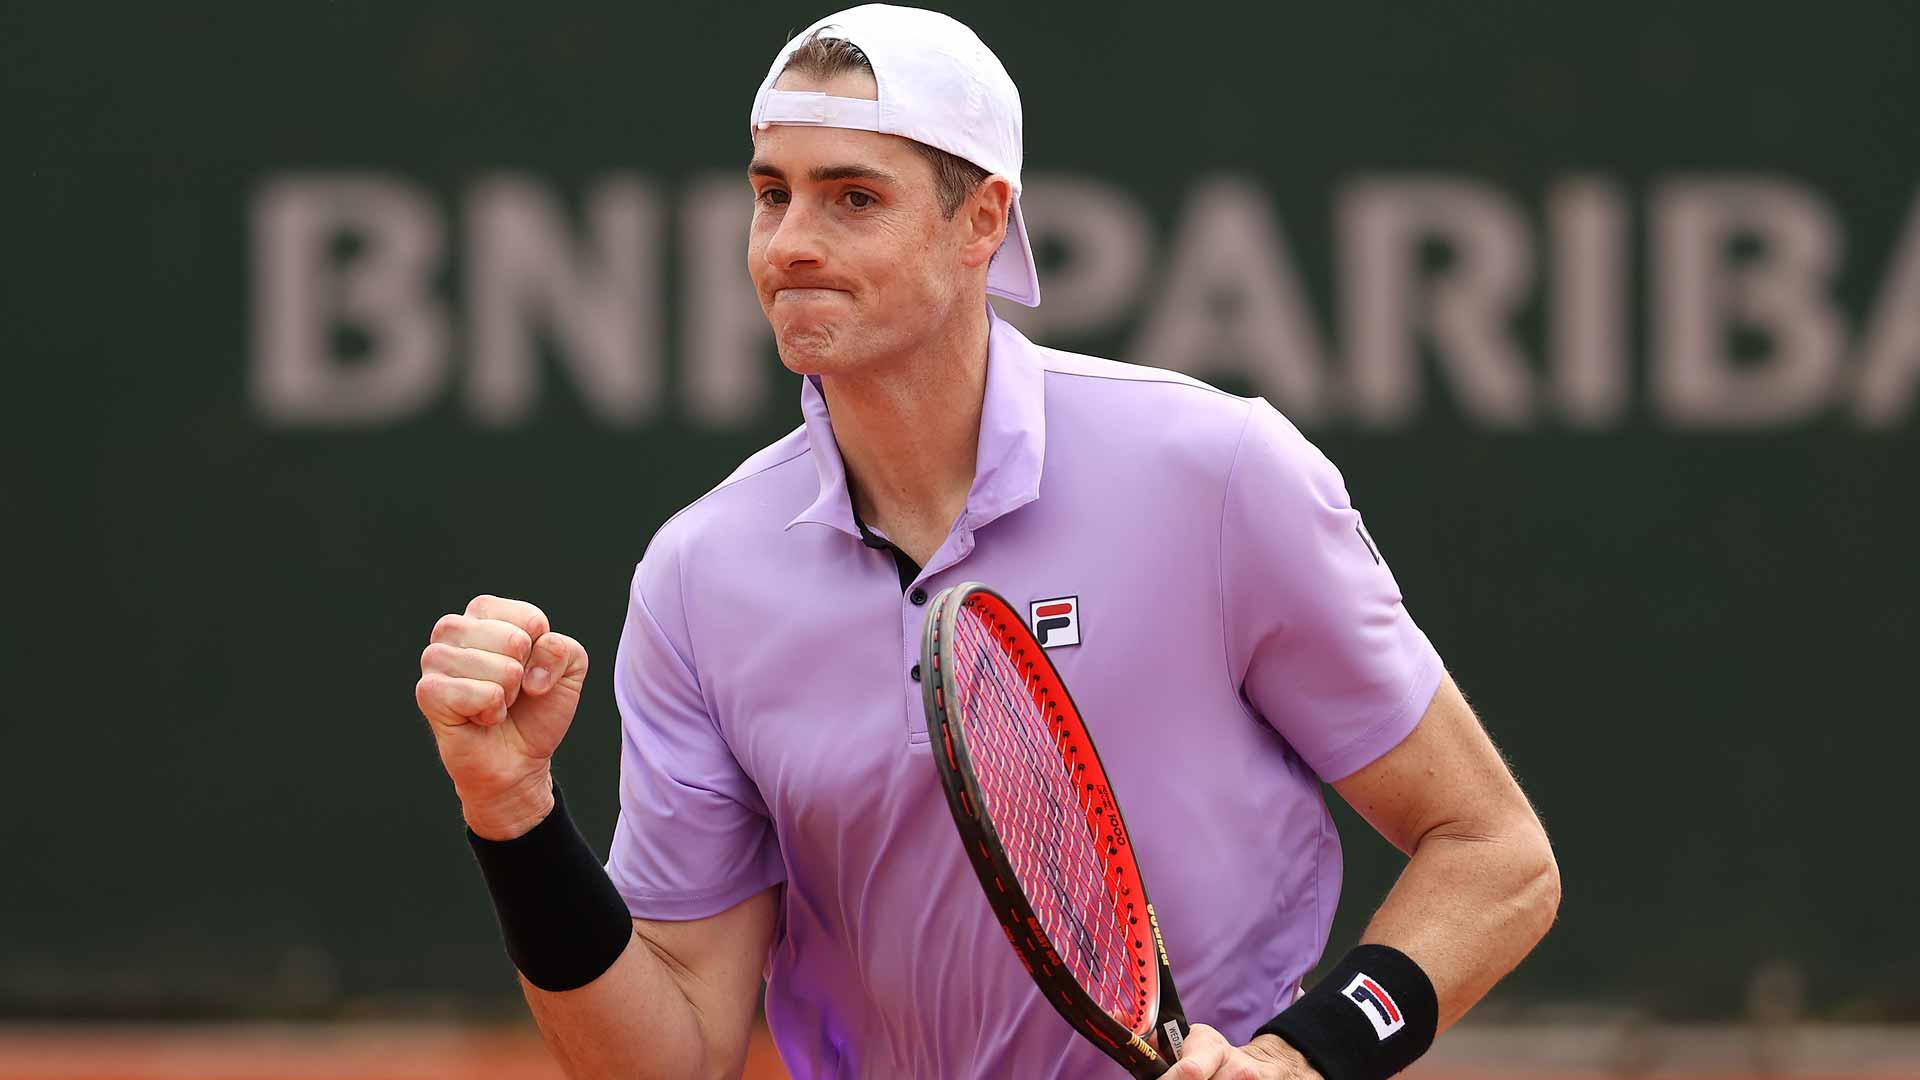 Los Cabos Open 2021: John Isner vs. Evgeny Donskoy Tennis Pick and Prediction